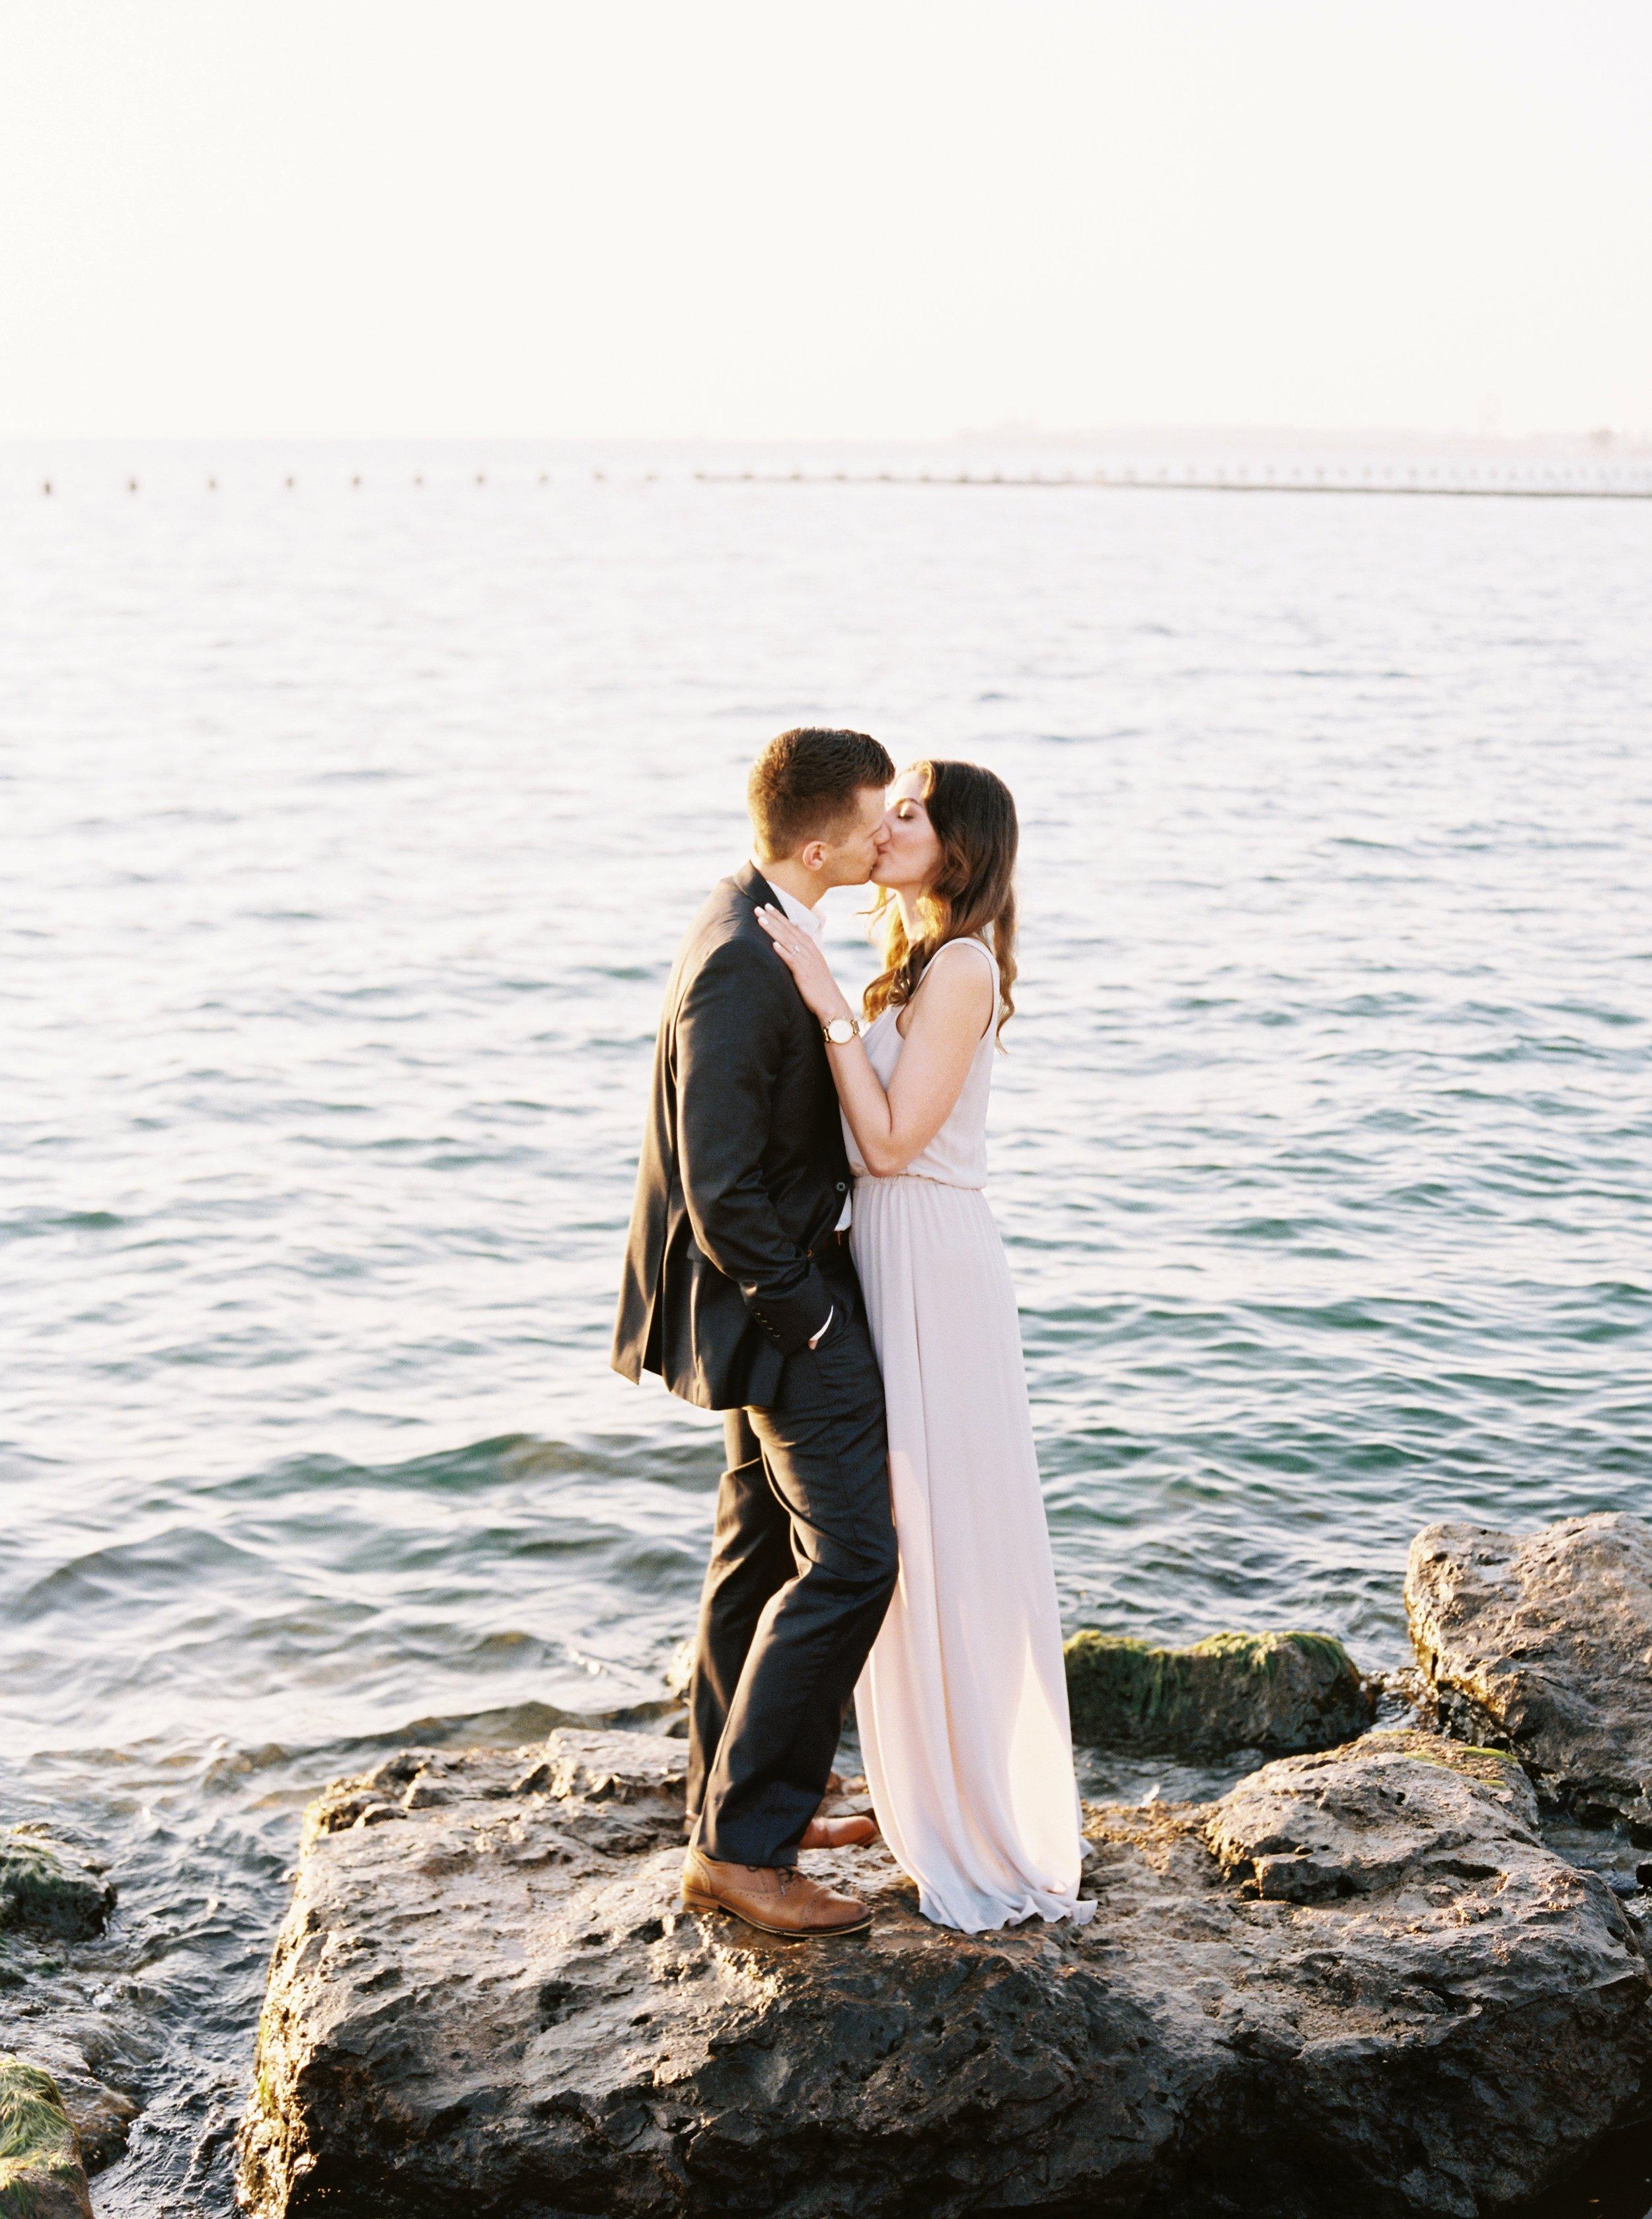 Kyle John l Fine Art Wedding Photography l Chicago, Copenhagen, California, New York, Destination l Blog l Nathalie and Colby_Lake Michigan_Sunrise Engagement_9